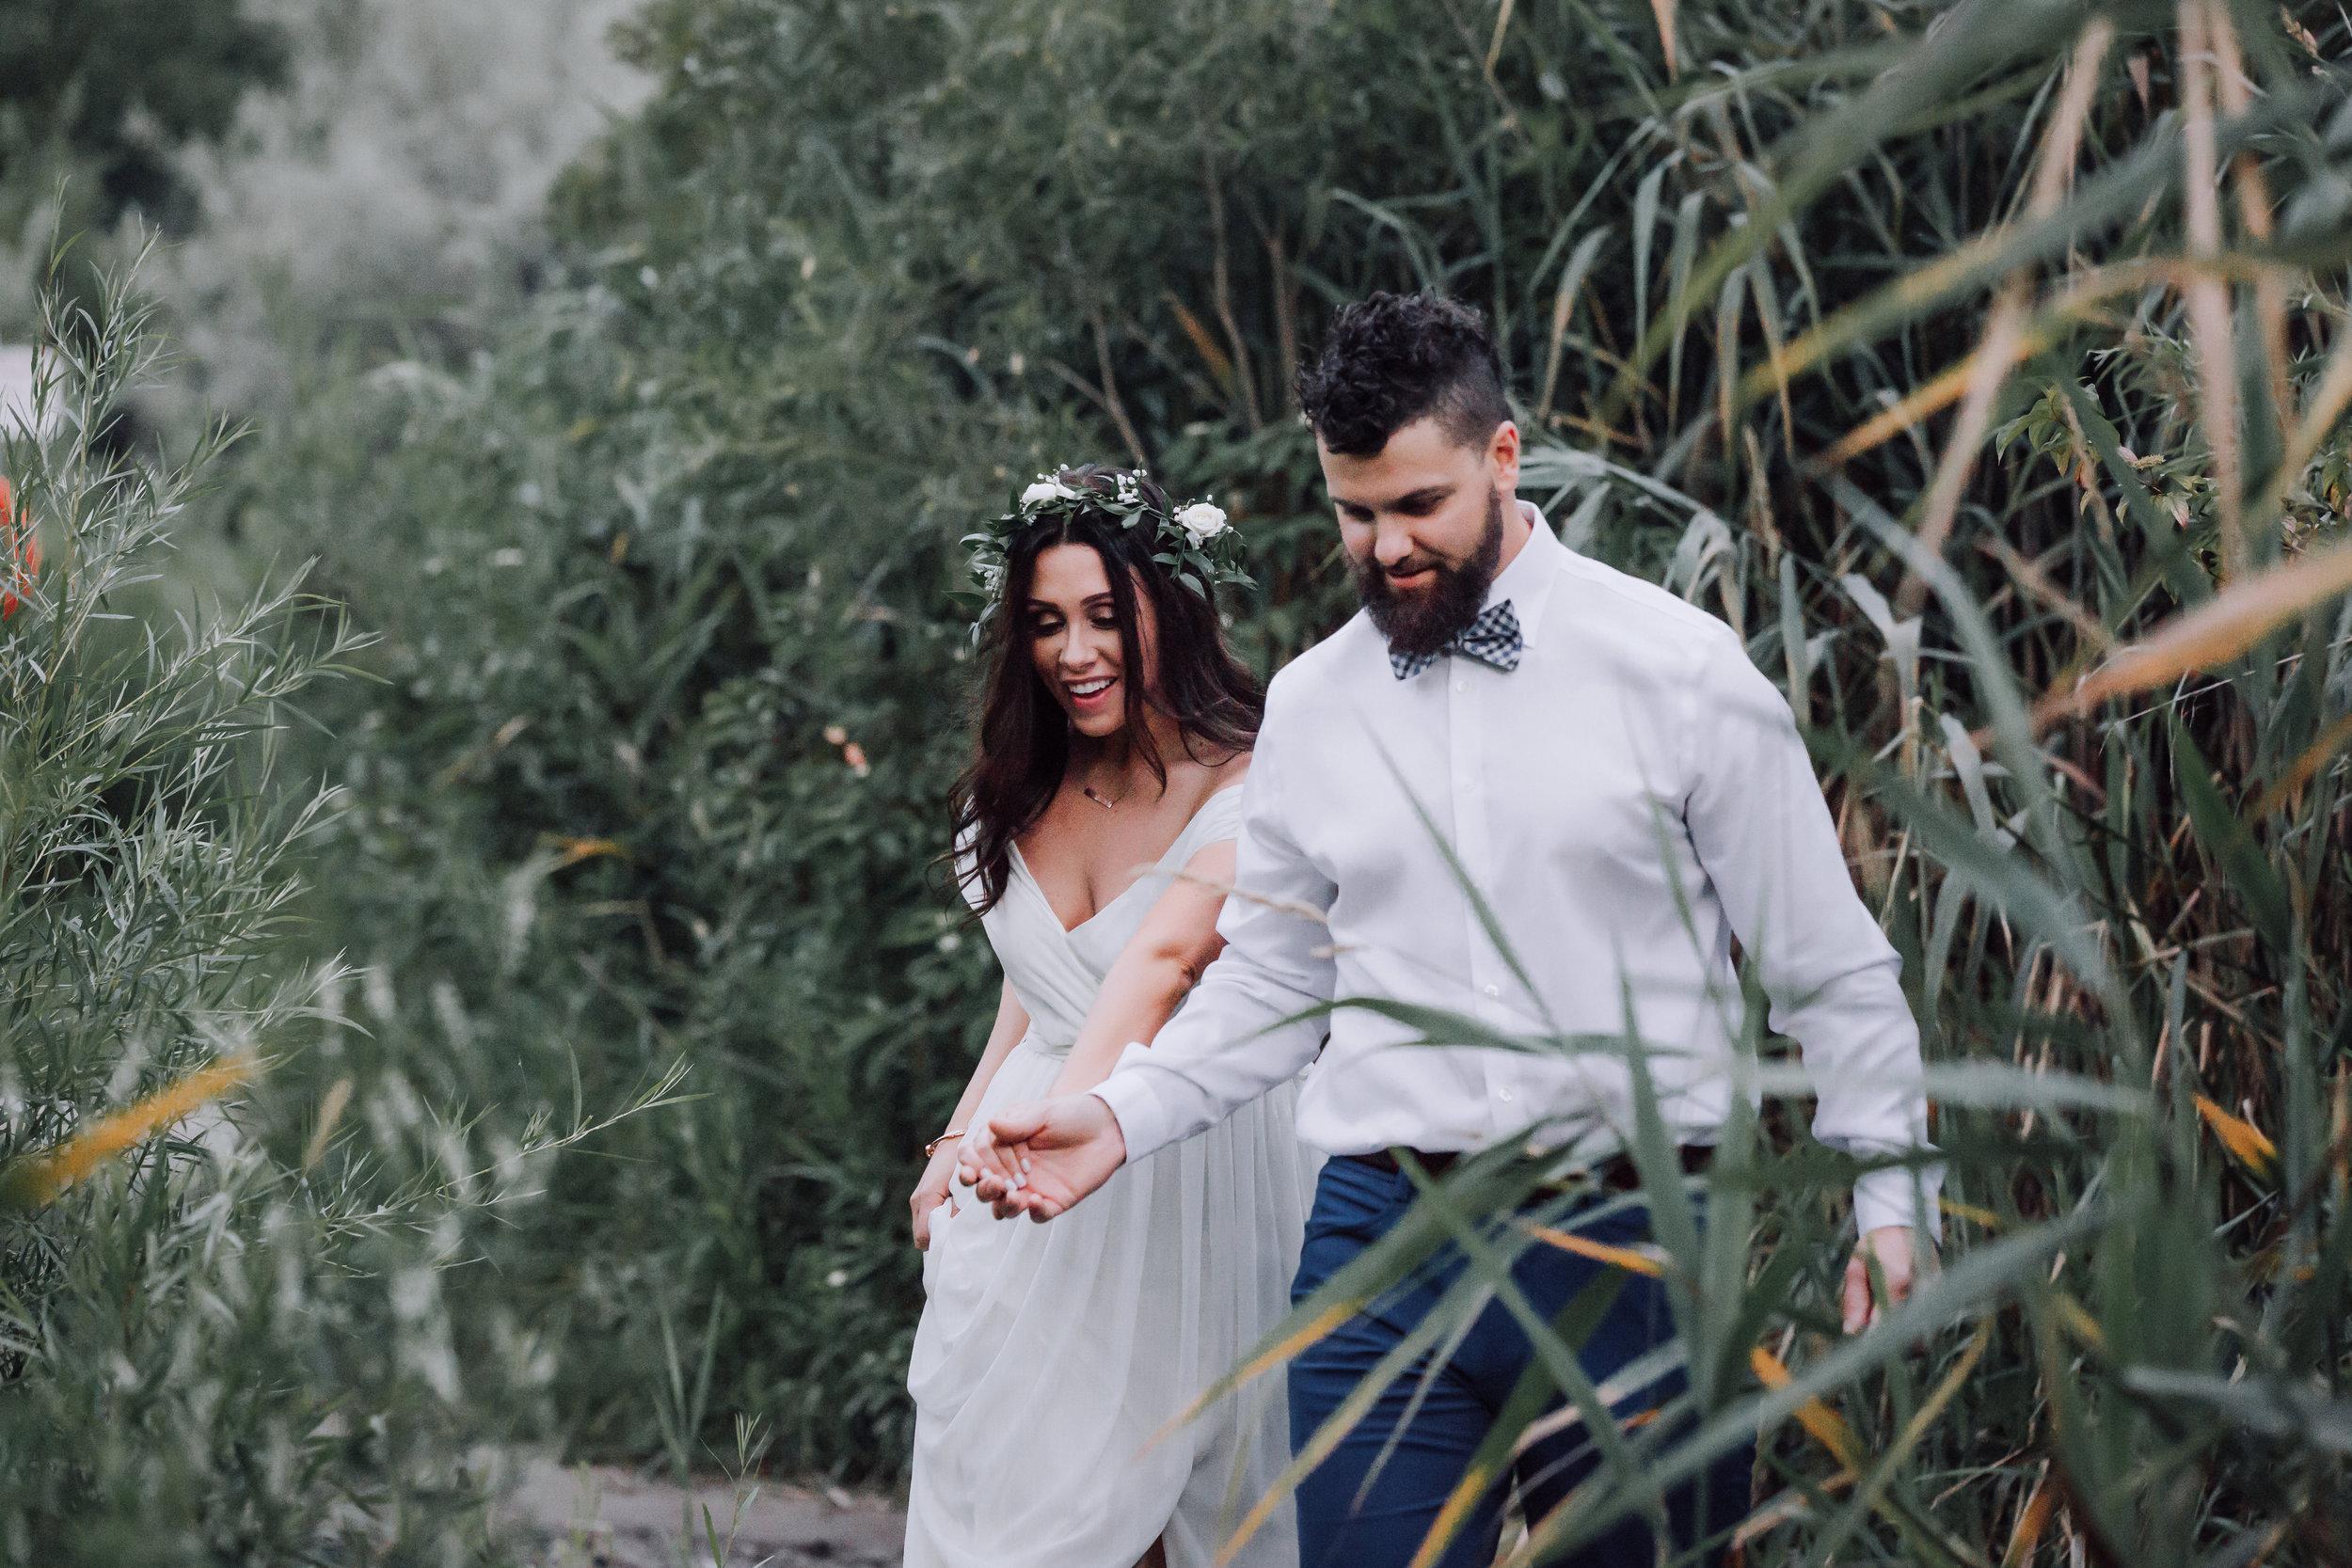 Jessica-Silveira-Photography-Wedding-Engagement-Toronto.jpg